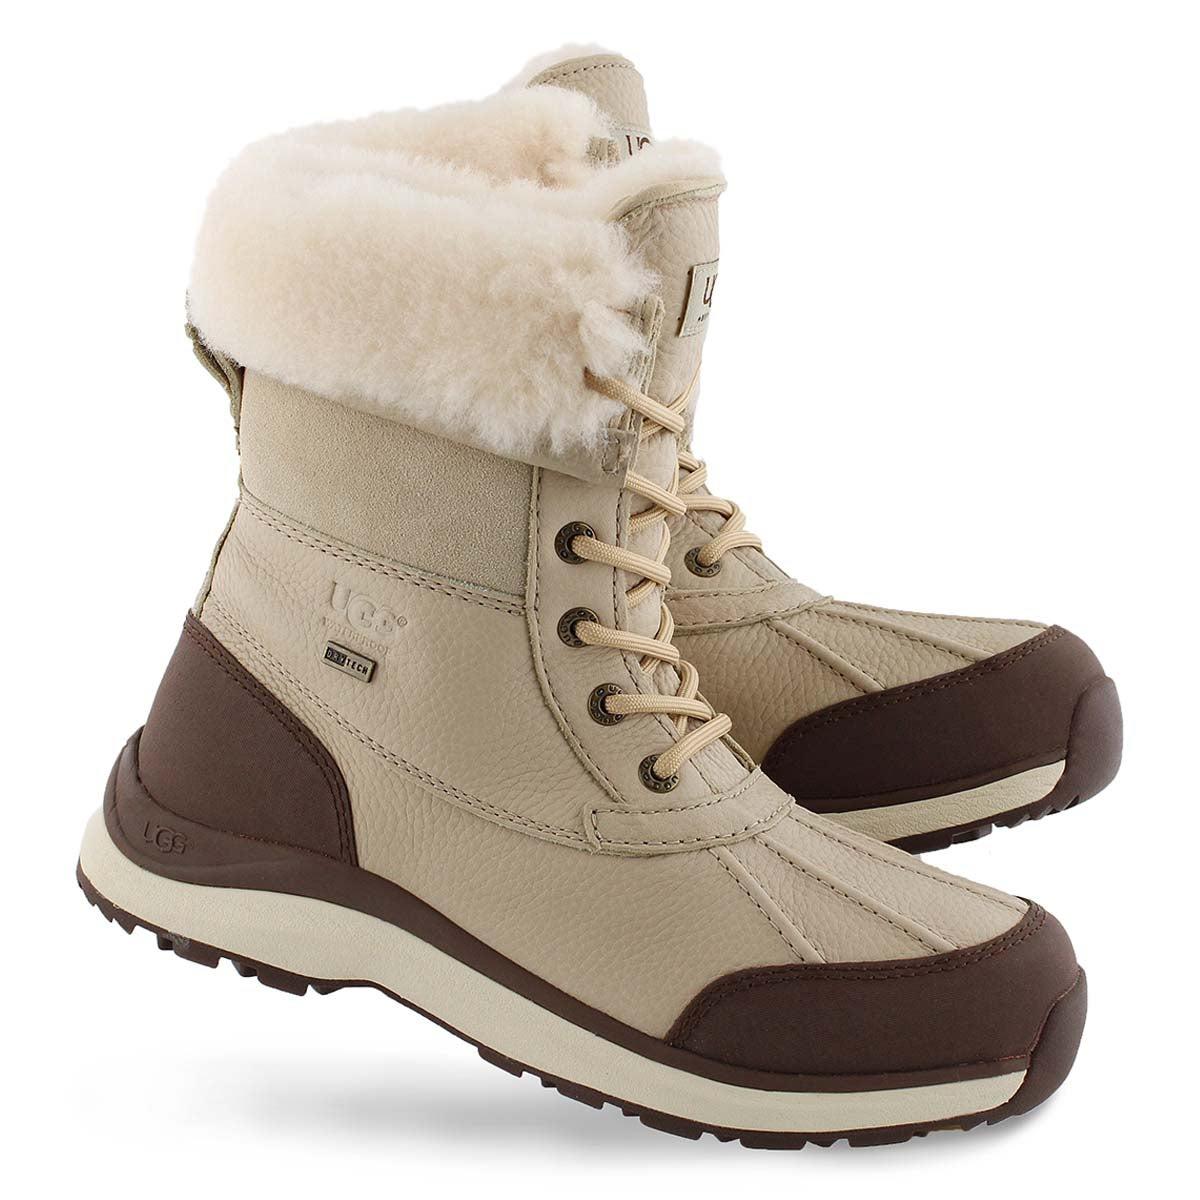 6d0370e4682 Women's ADIRONDACK III sand winter boots